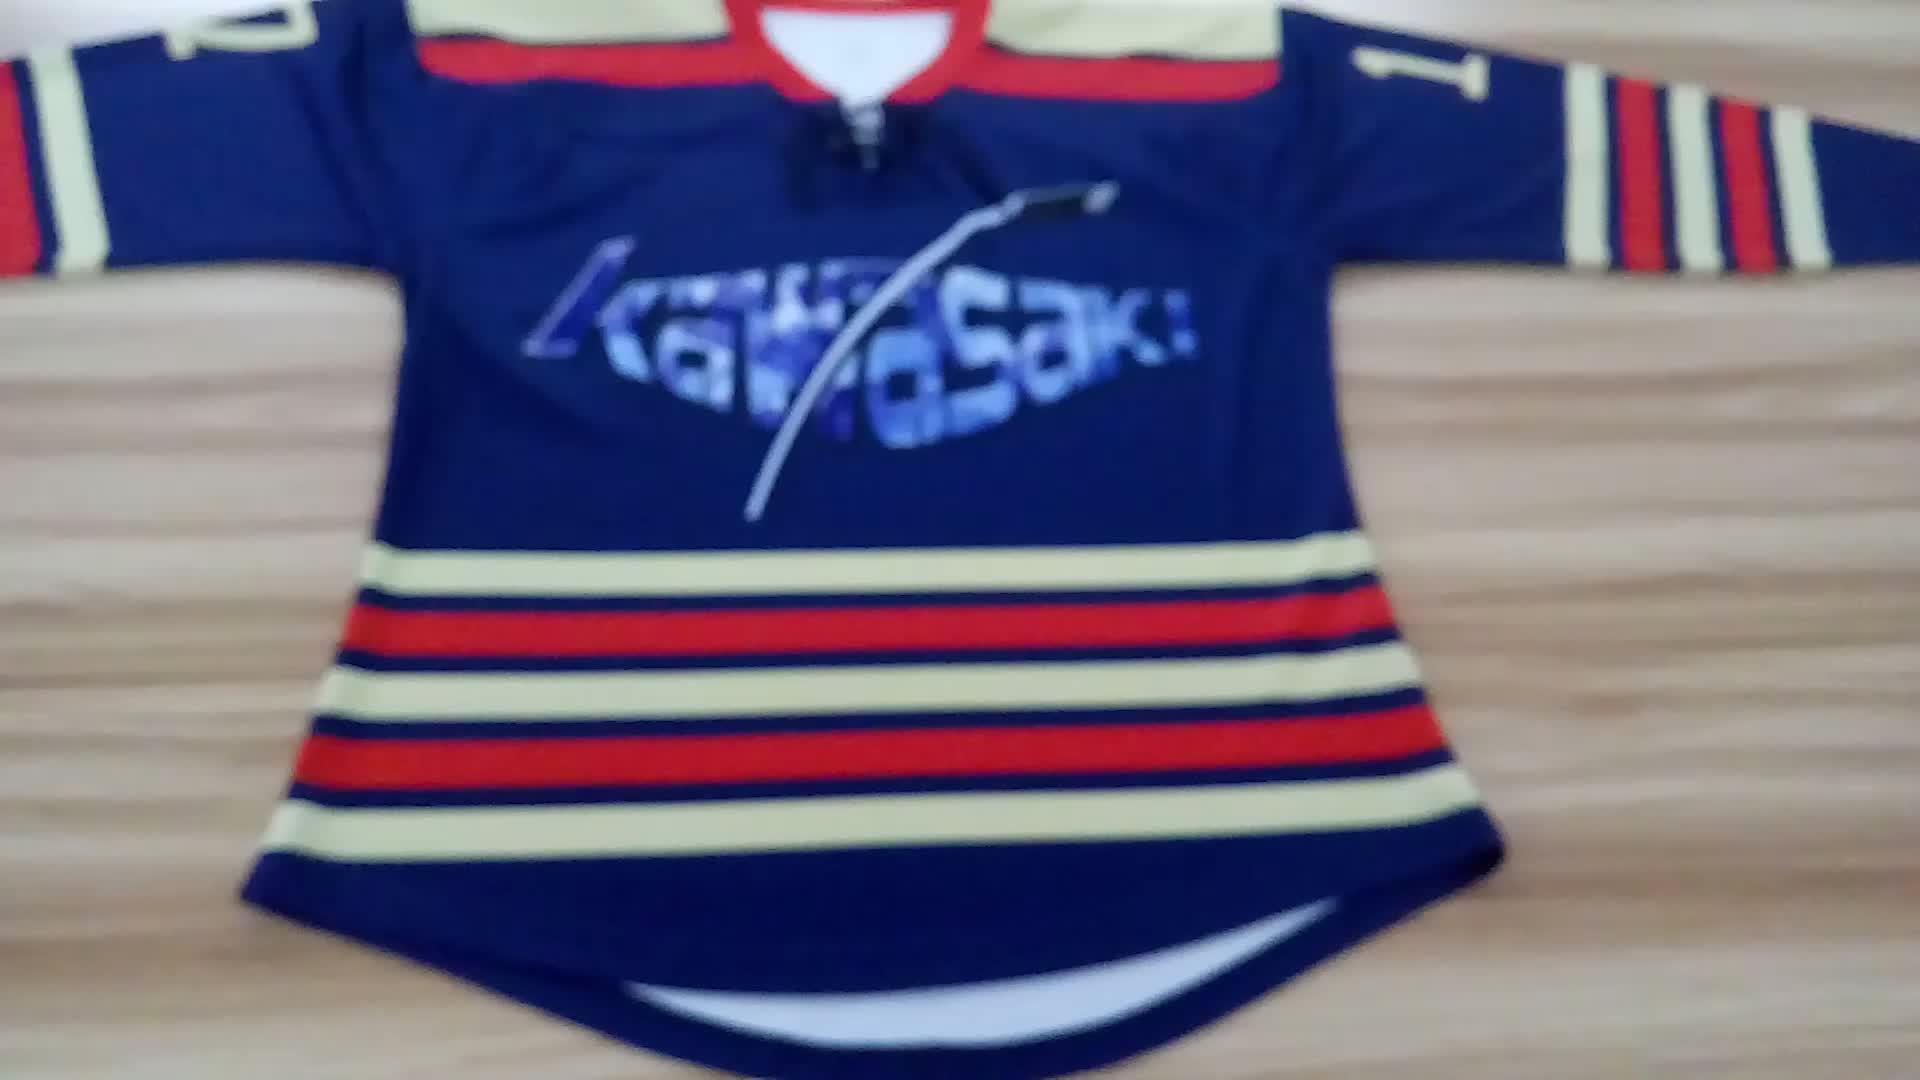 Custom 6xl hockey jersey, team set tackle twill hockey jerseys